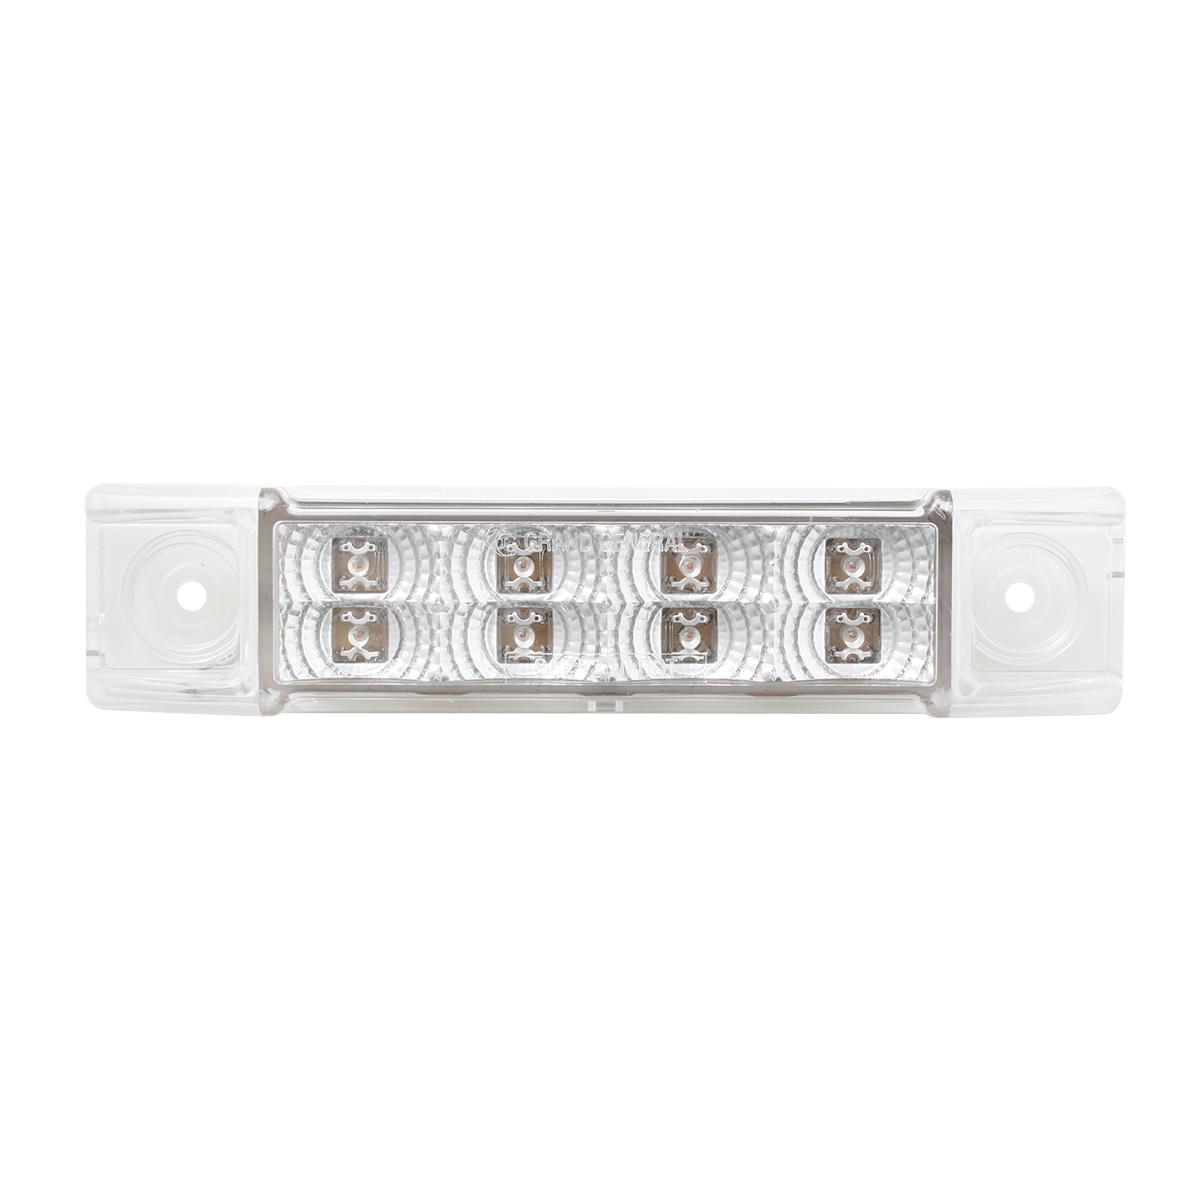 Rectangular Spyder Dual Function LED Light in Clear Lens